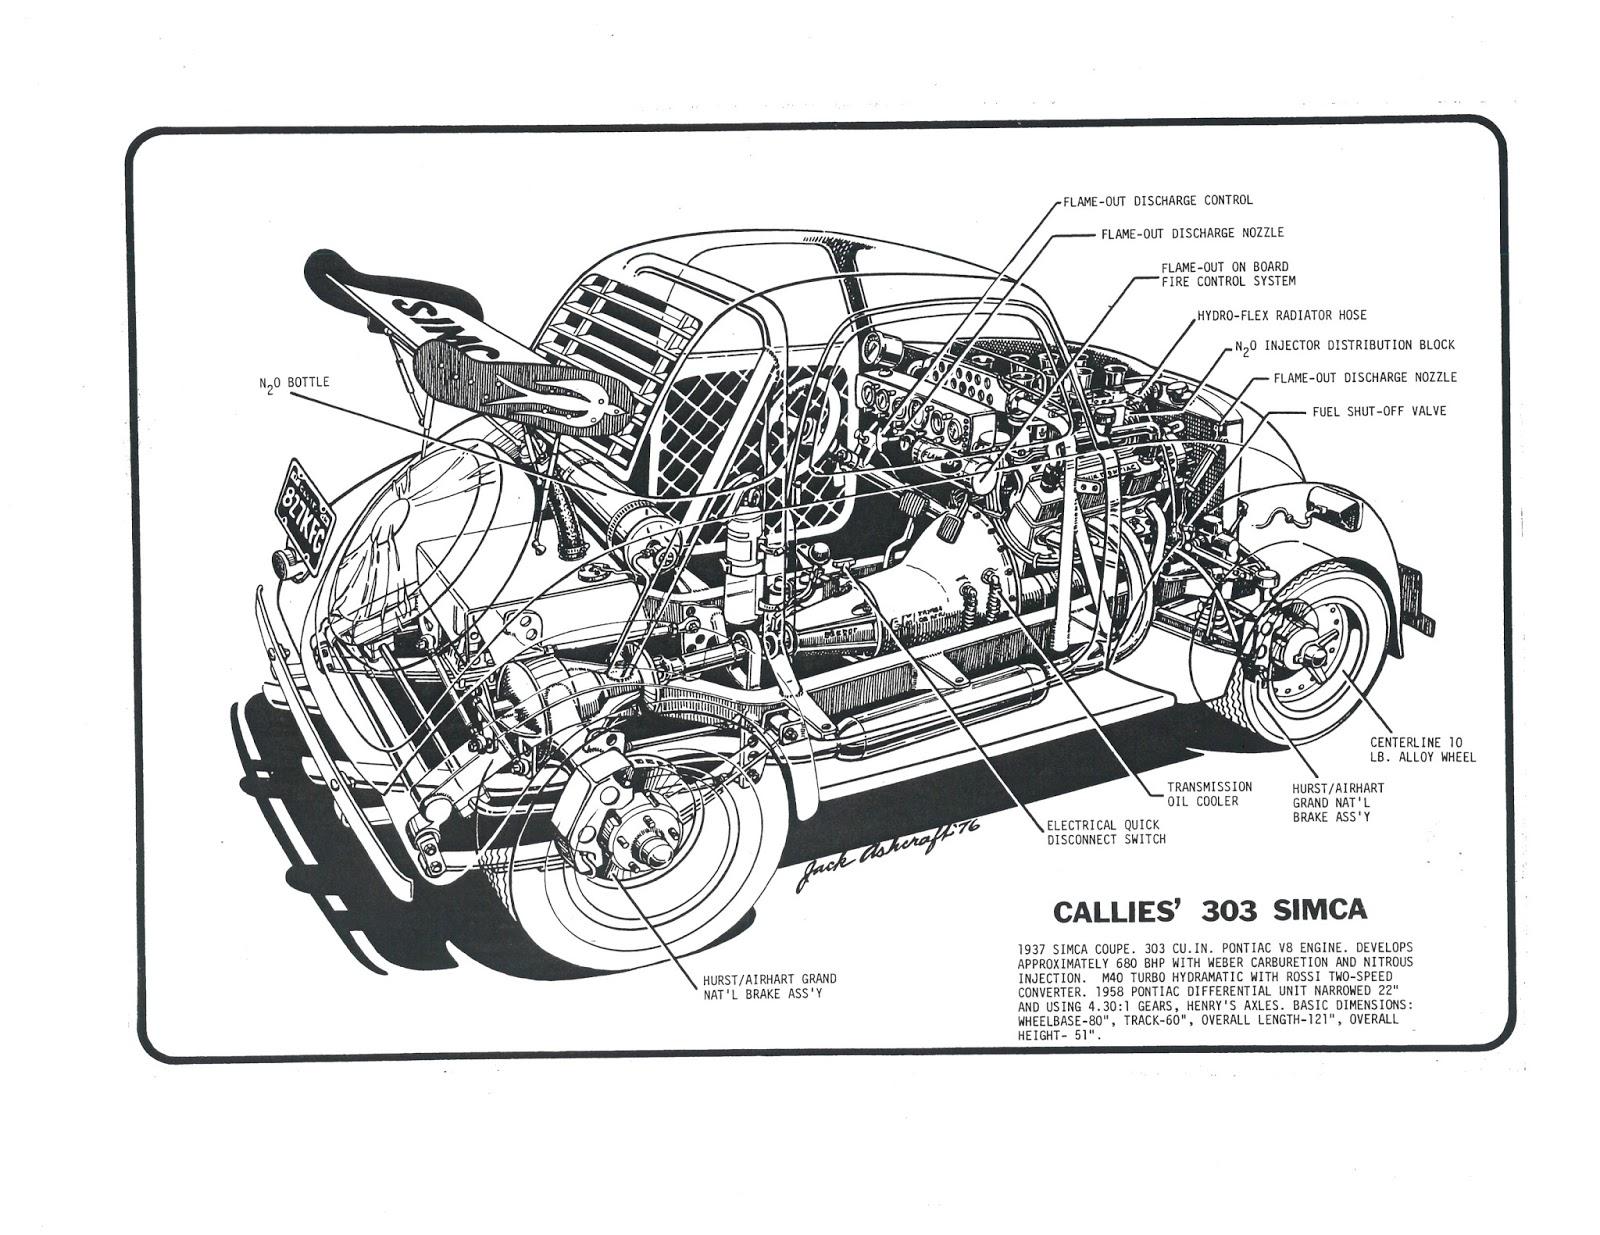 Fiat Topolino Wiring Diagram Just Another Blog 1981 Spider Diagrams Library Rh 15 Mac Happen De 500 Engine